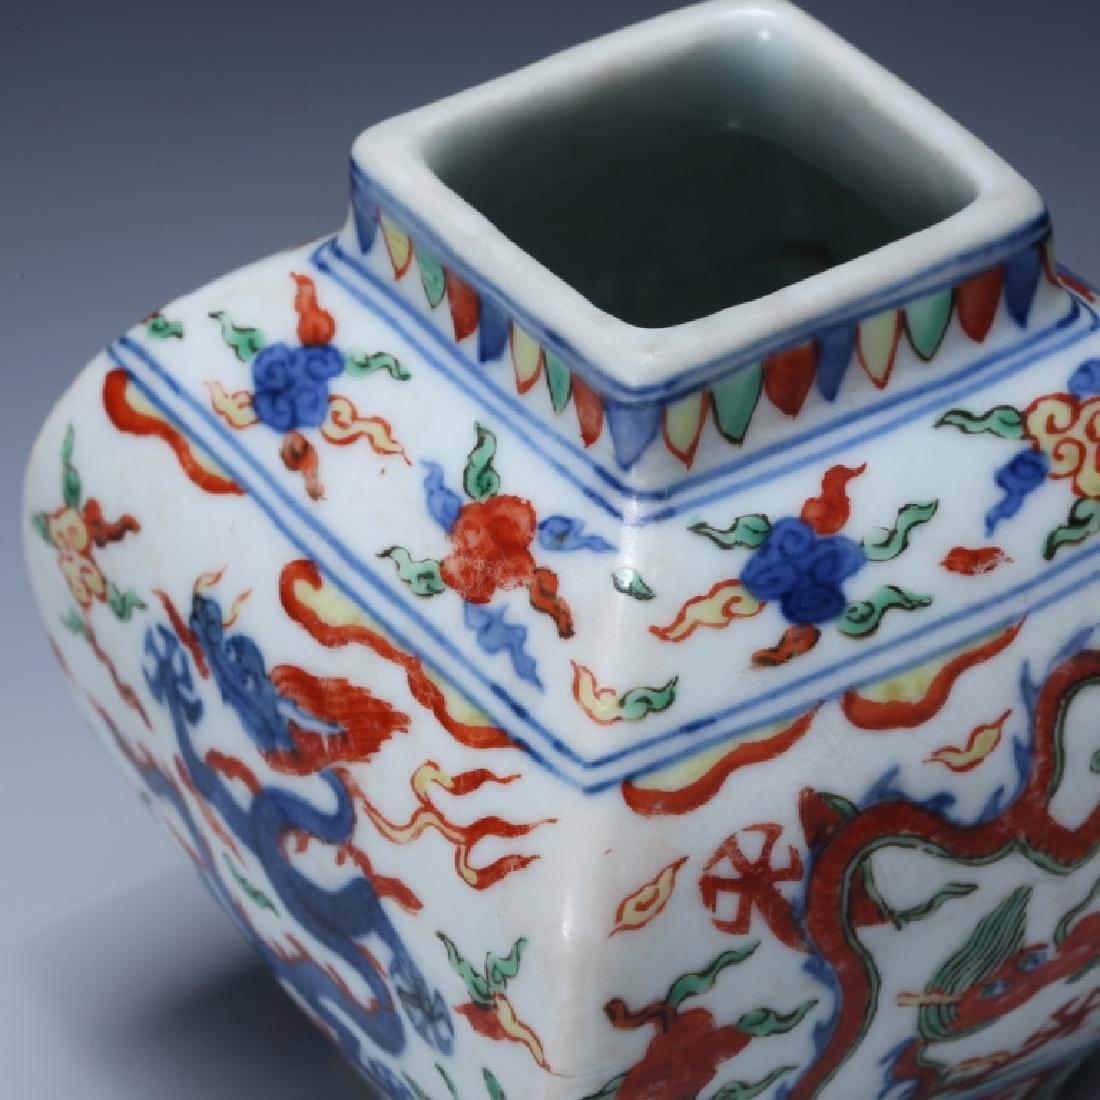 Chinese Qing Dynasty Wucai Porcelain Jar - 5